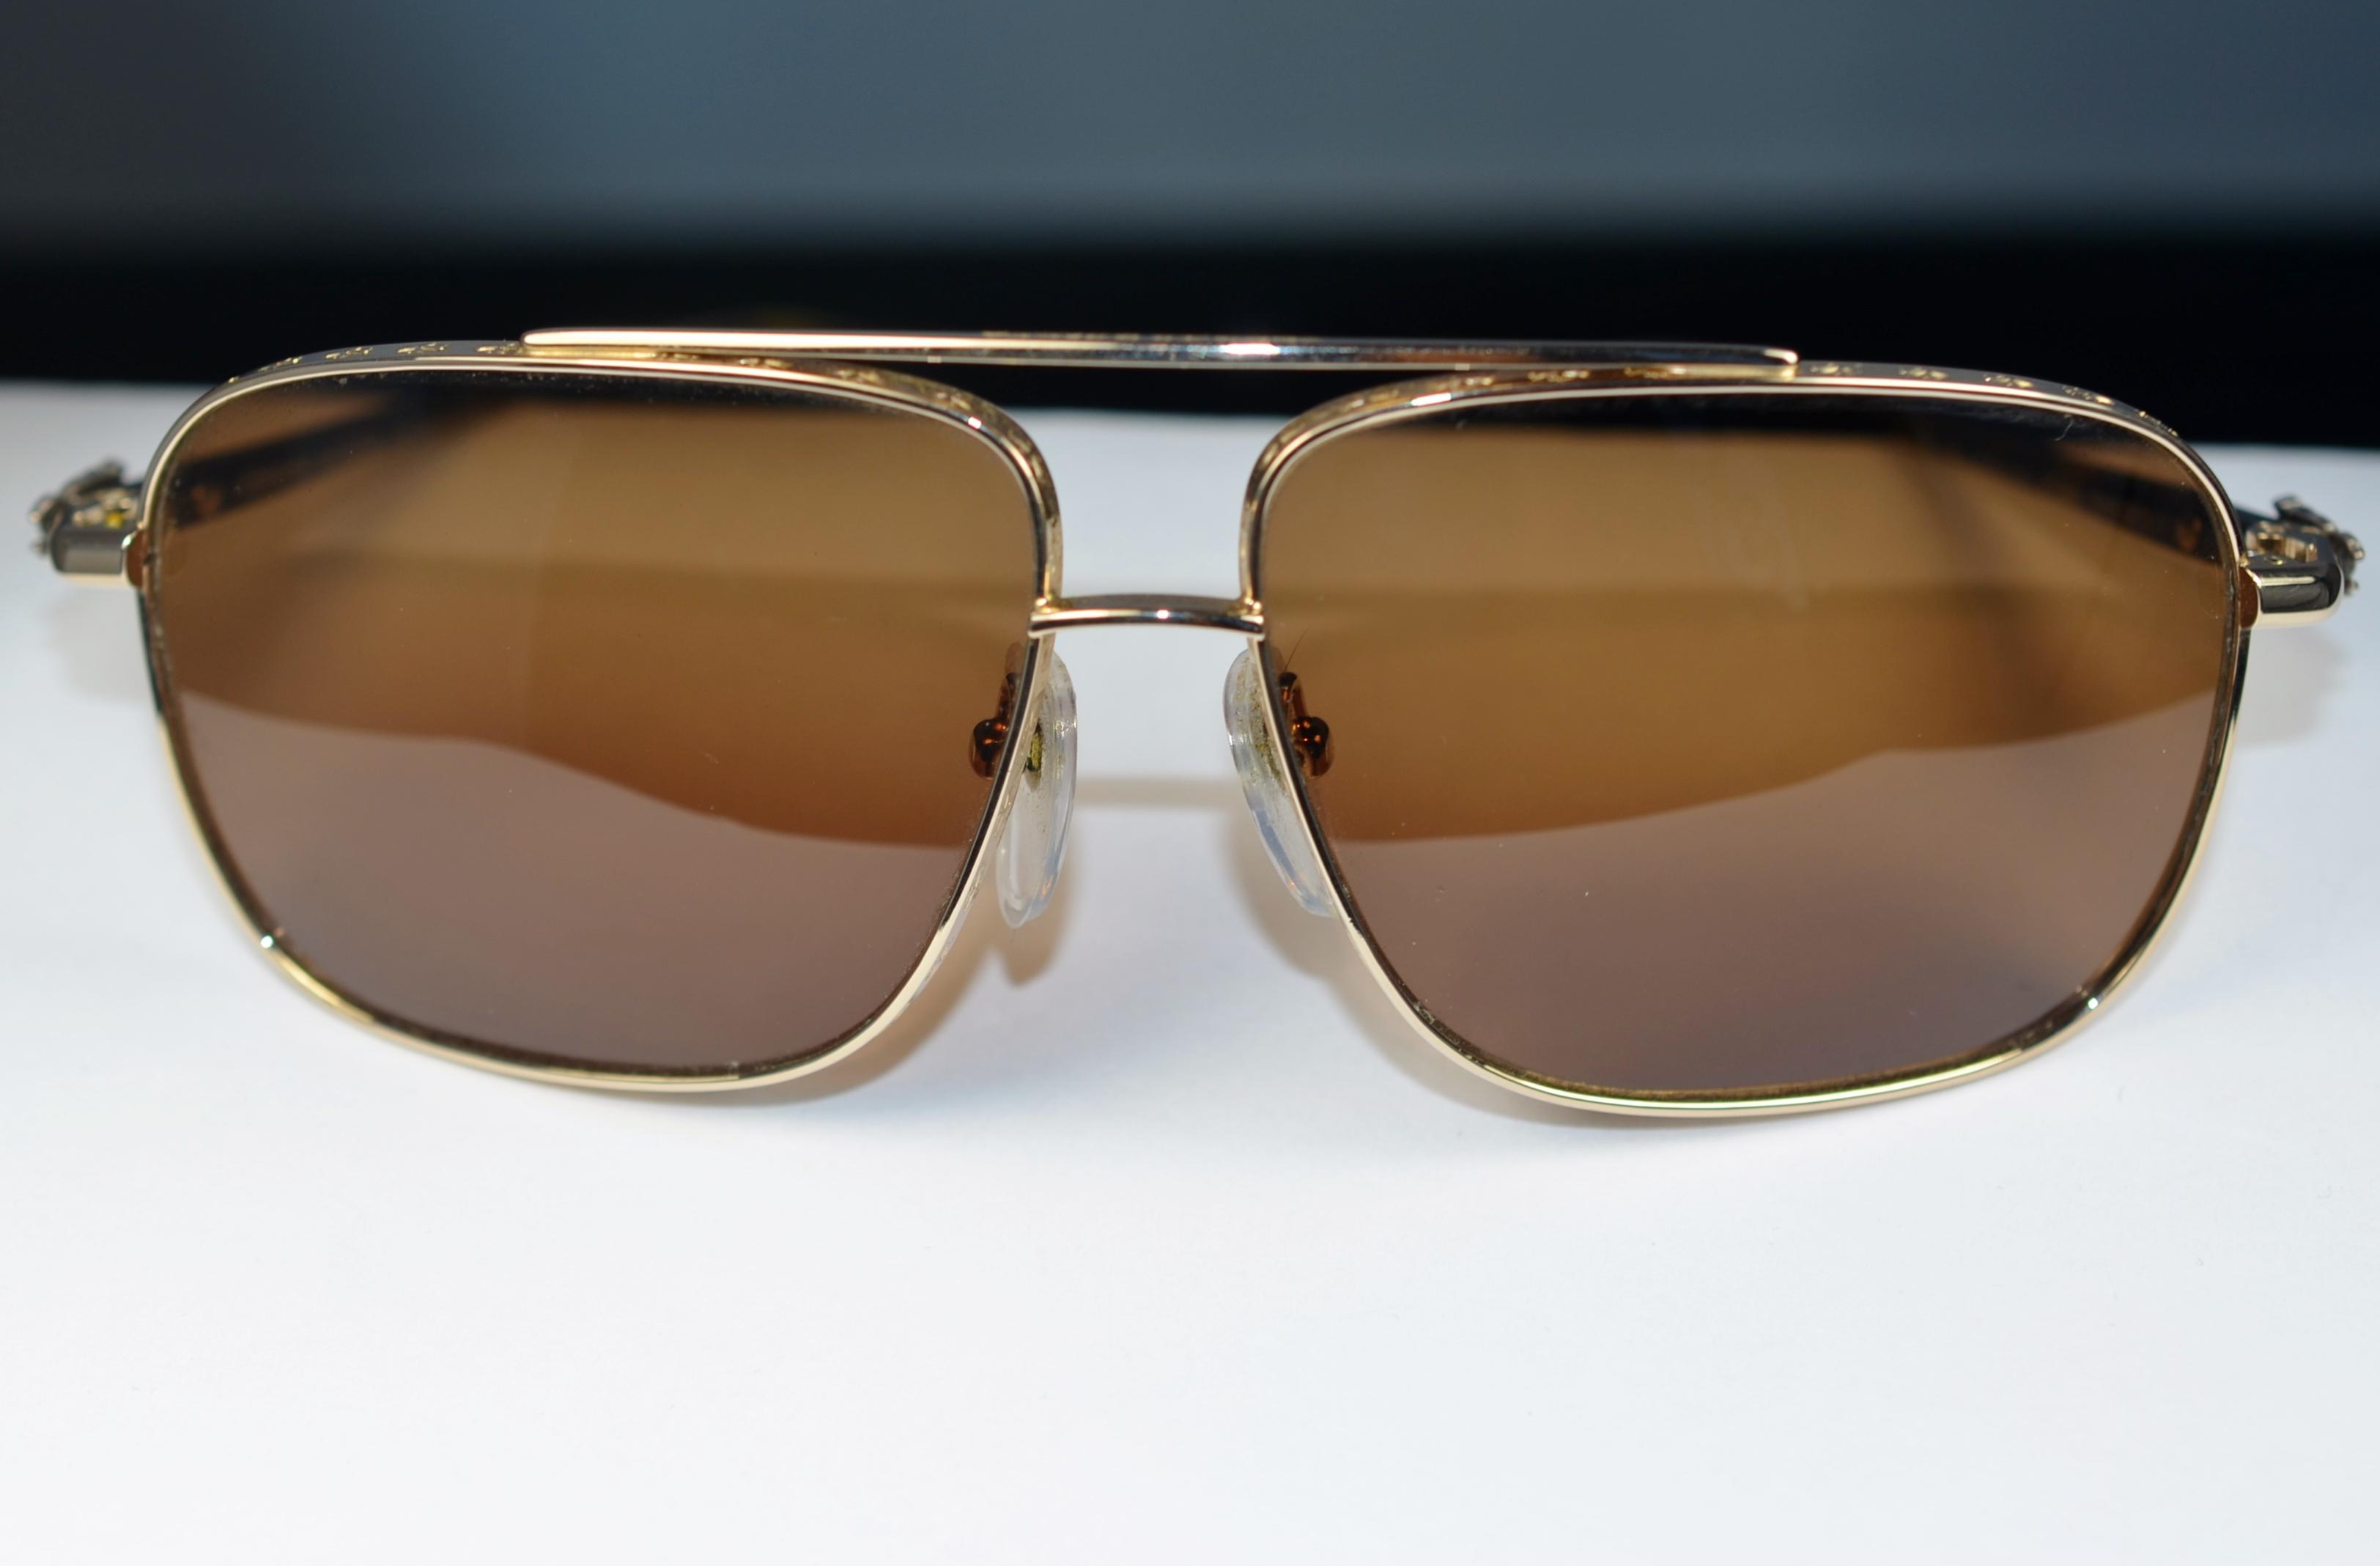 1231989fc222 Chrome Hearts Pork Sword Mens Polarized Sunglasses Frames Made in Japan